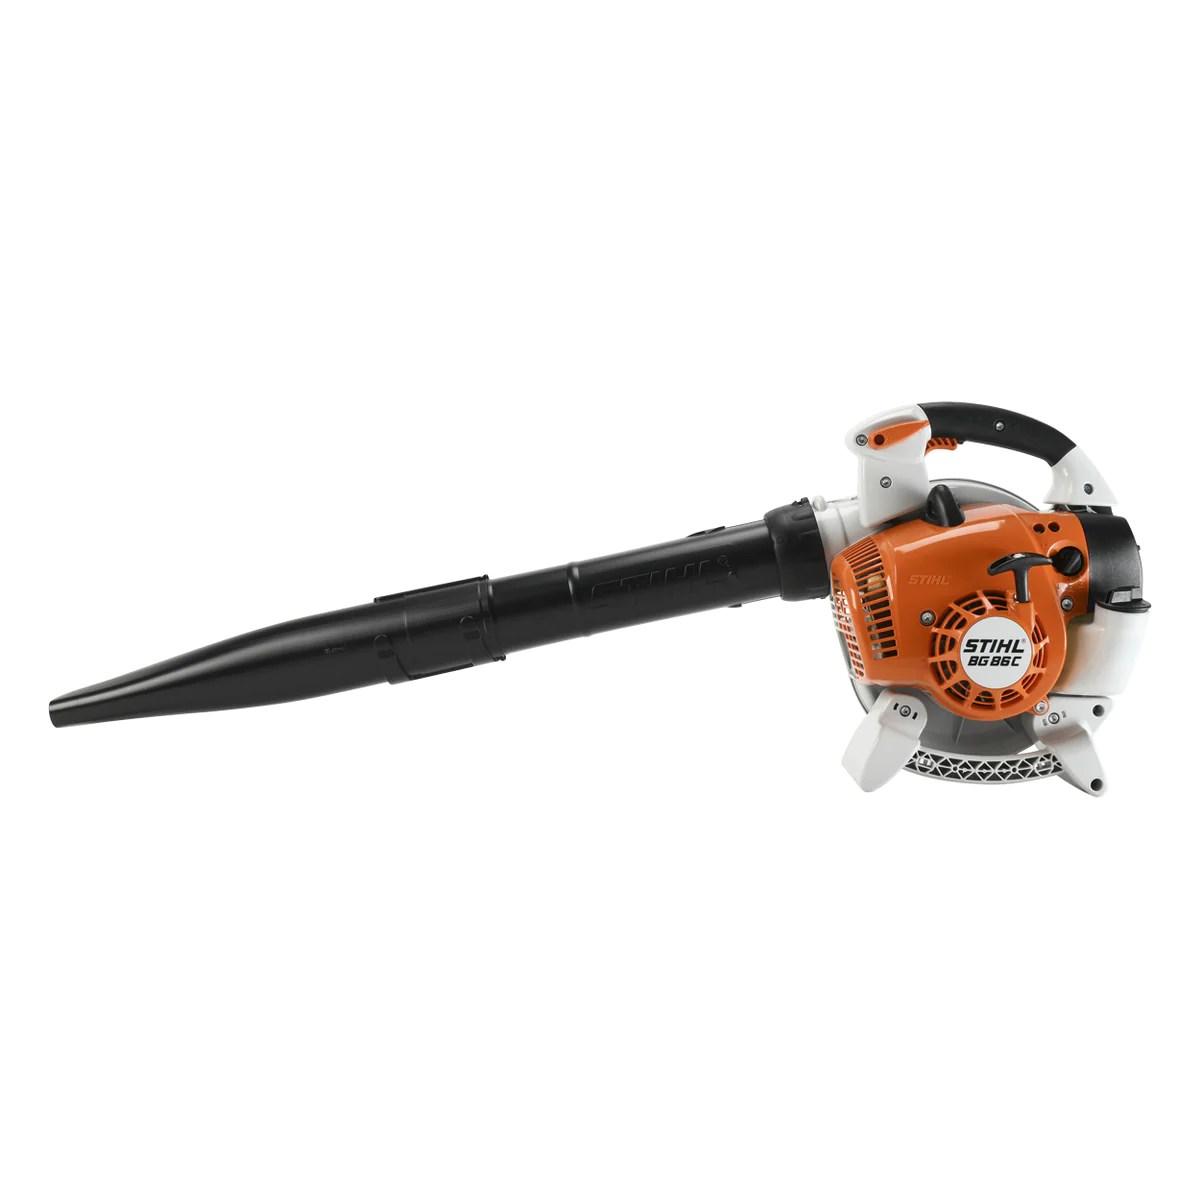 Stihl BG86C-E Petrol Leaf Blower — GYC Mower Depot